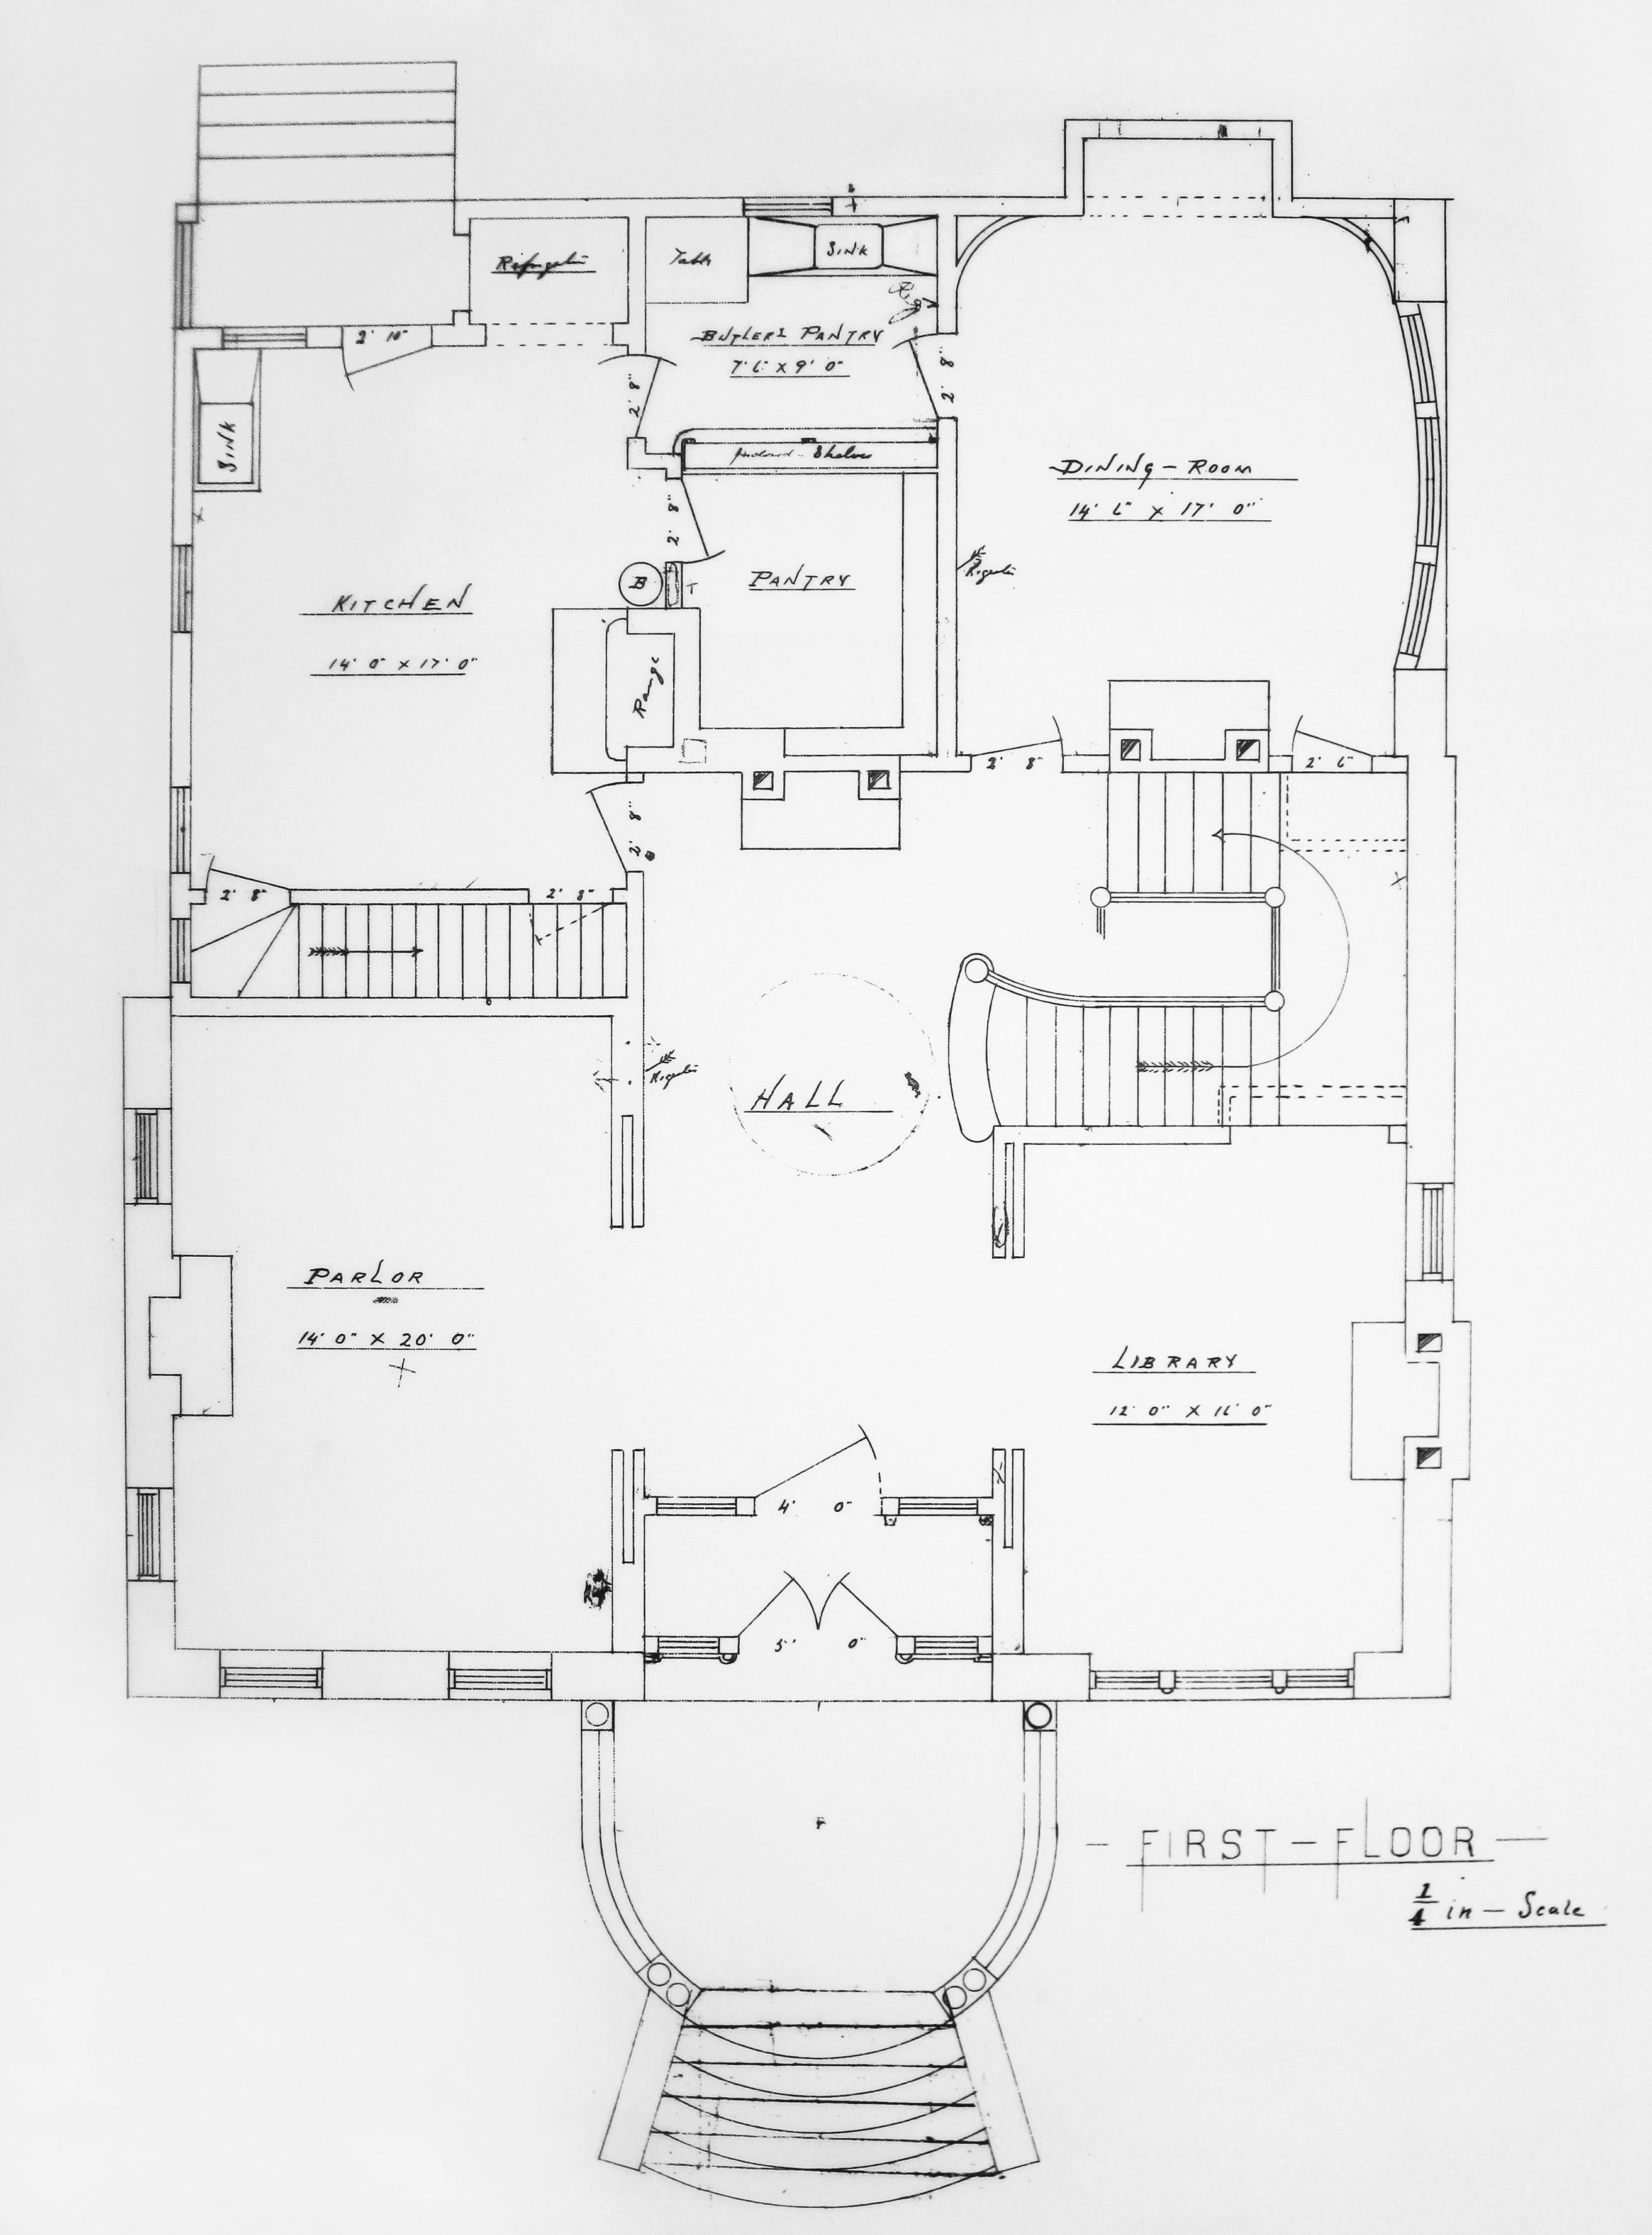 Blueprint of the Hudson House First Floor